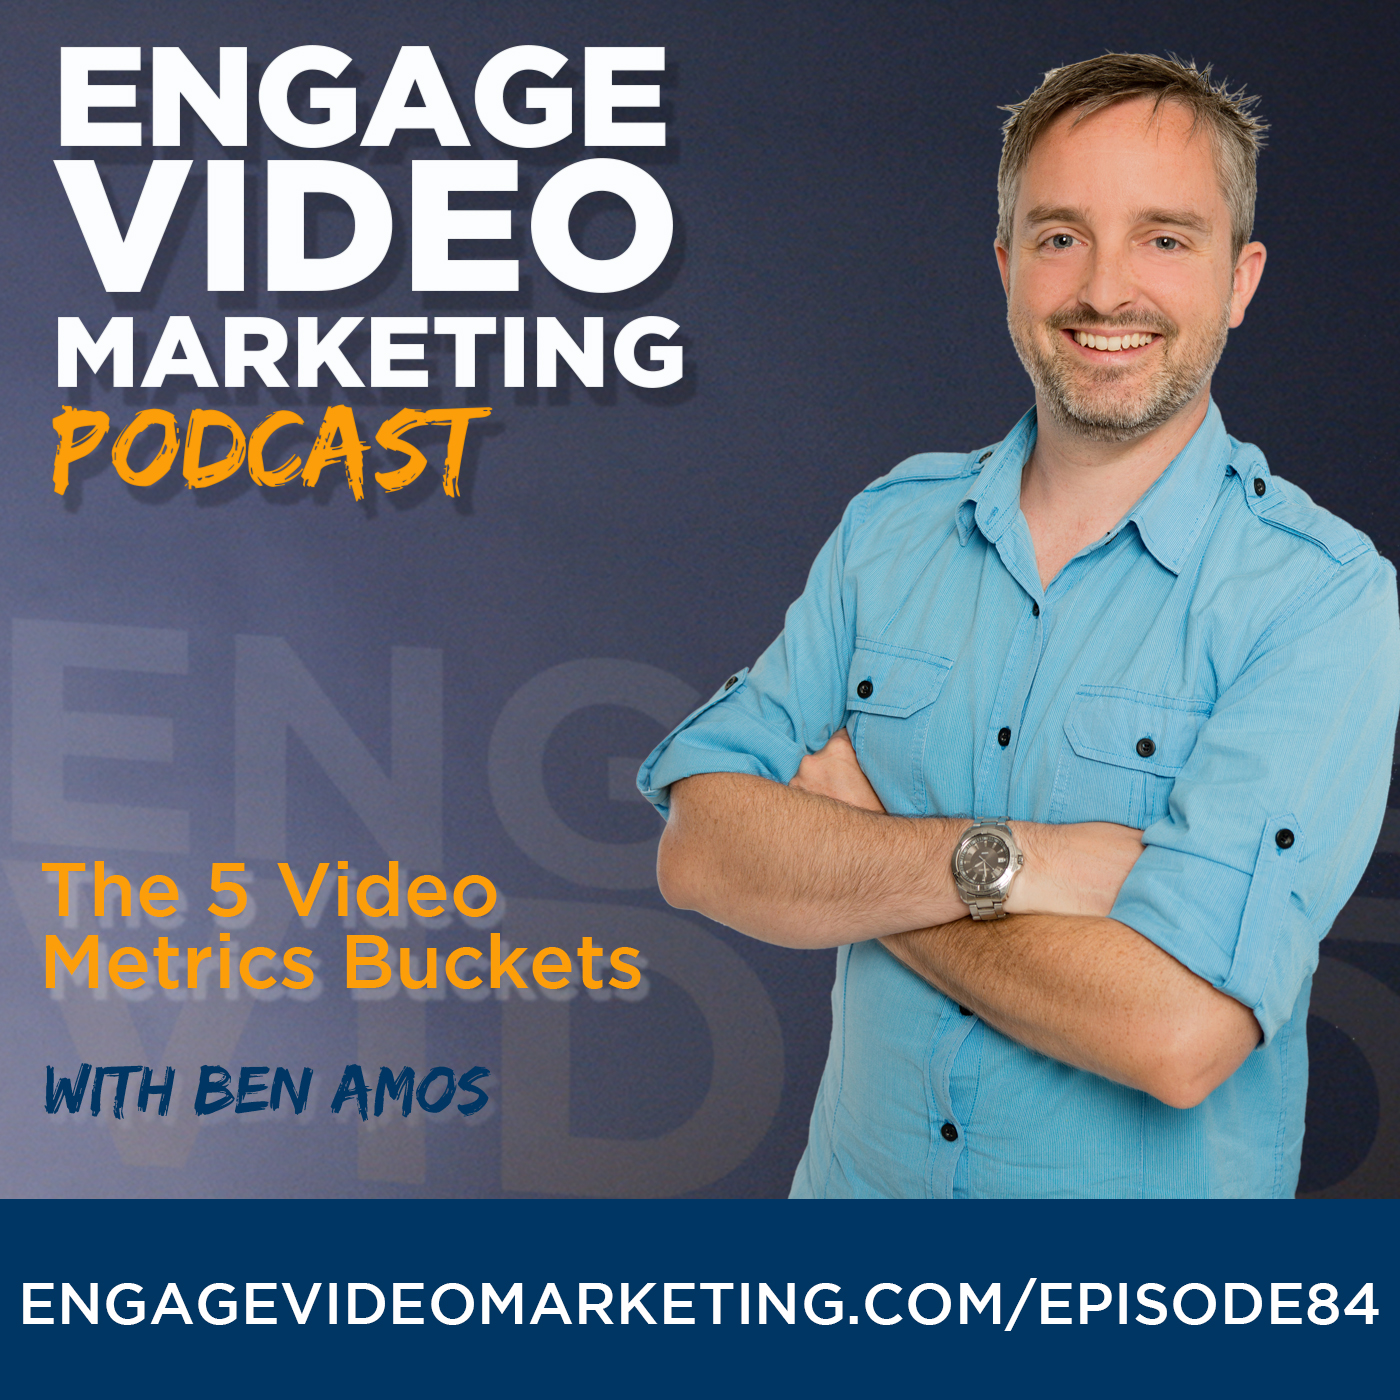 The 5 Video Metrics Buckets